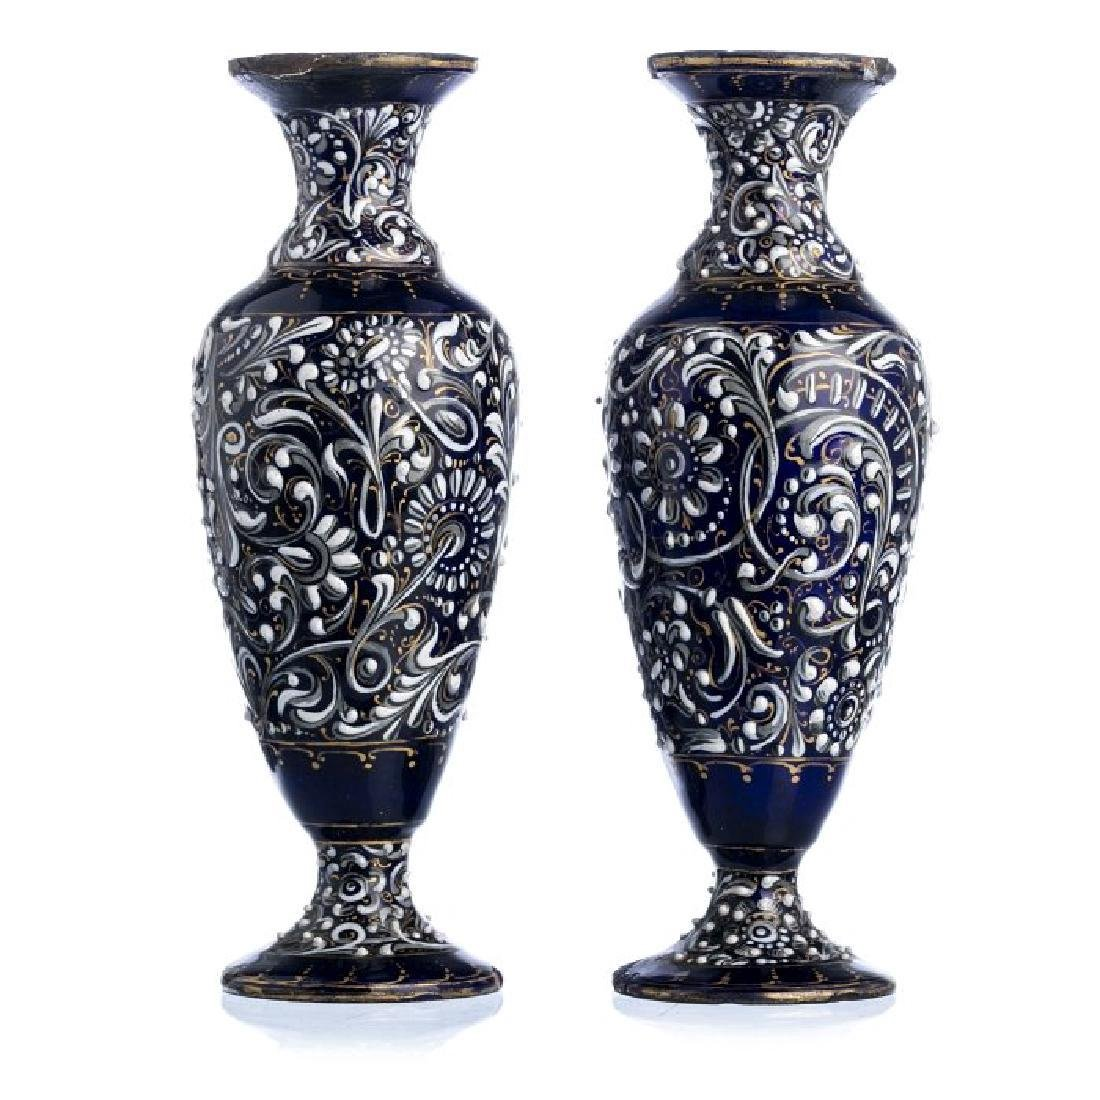 Pair of Enamel on Copper Limoges Vases